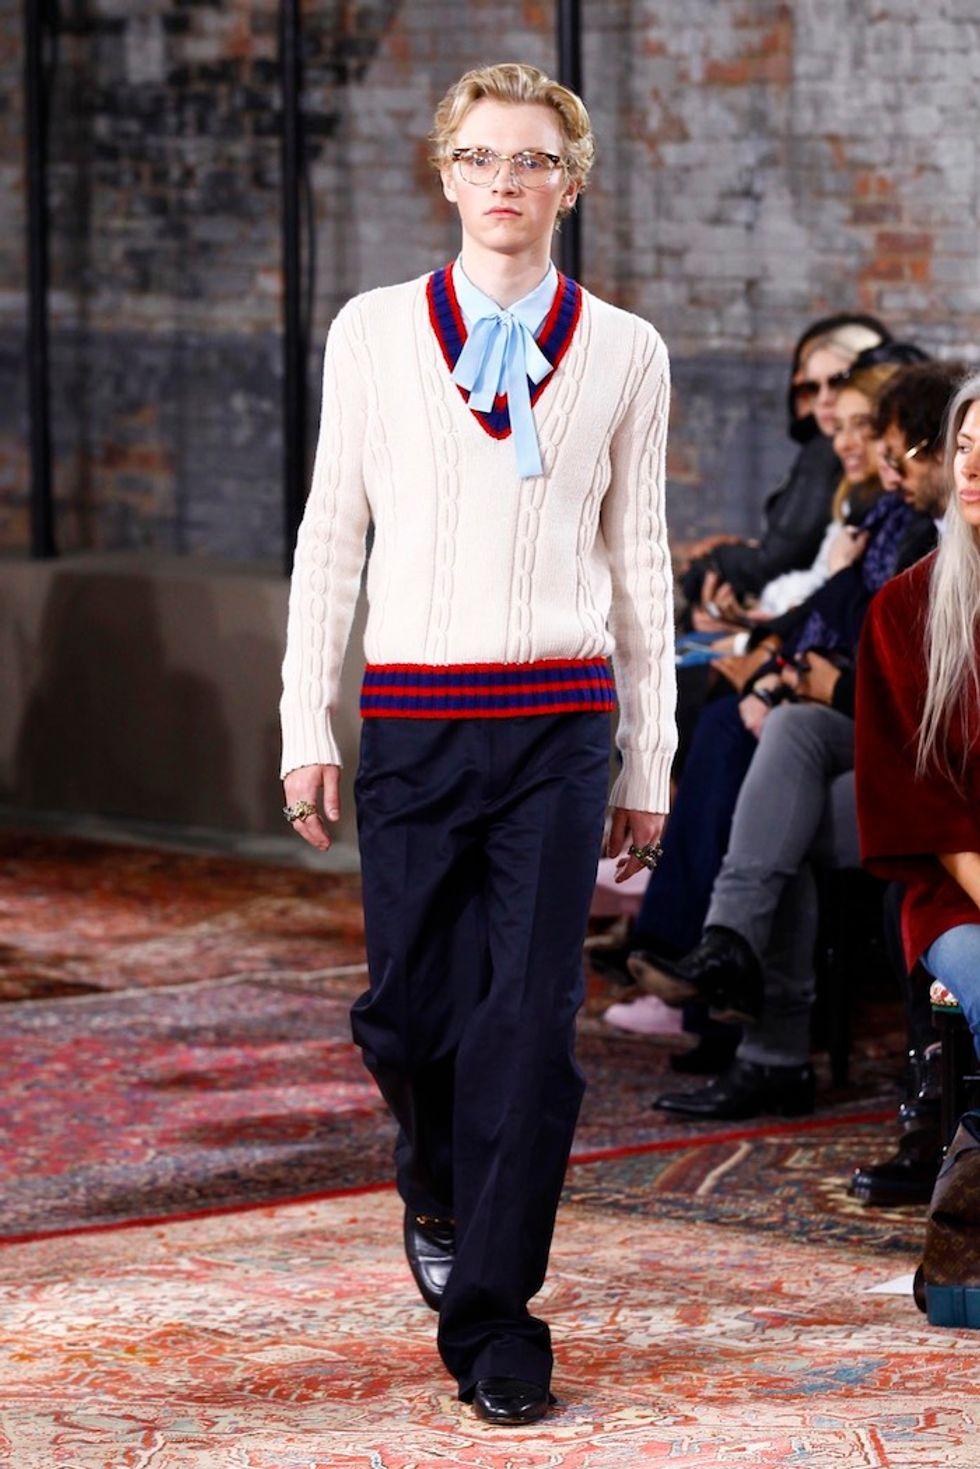 Will Fashion Editors' Love of Alessandro Michele's New Gucci Designs Translate to Sales?